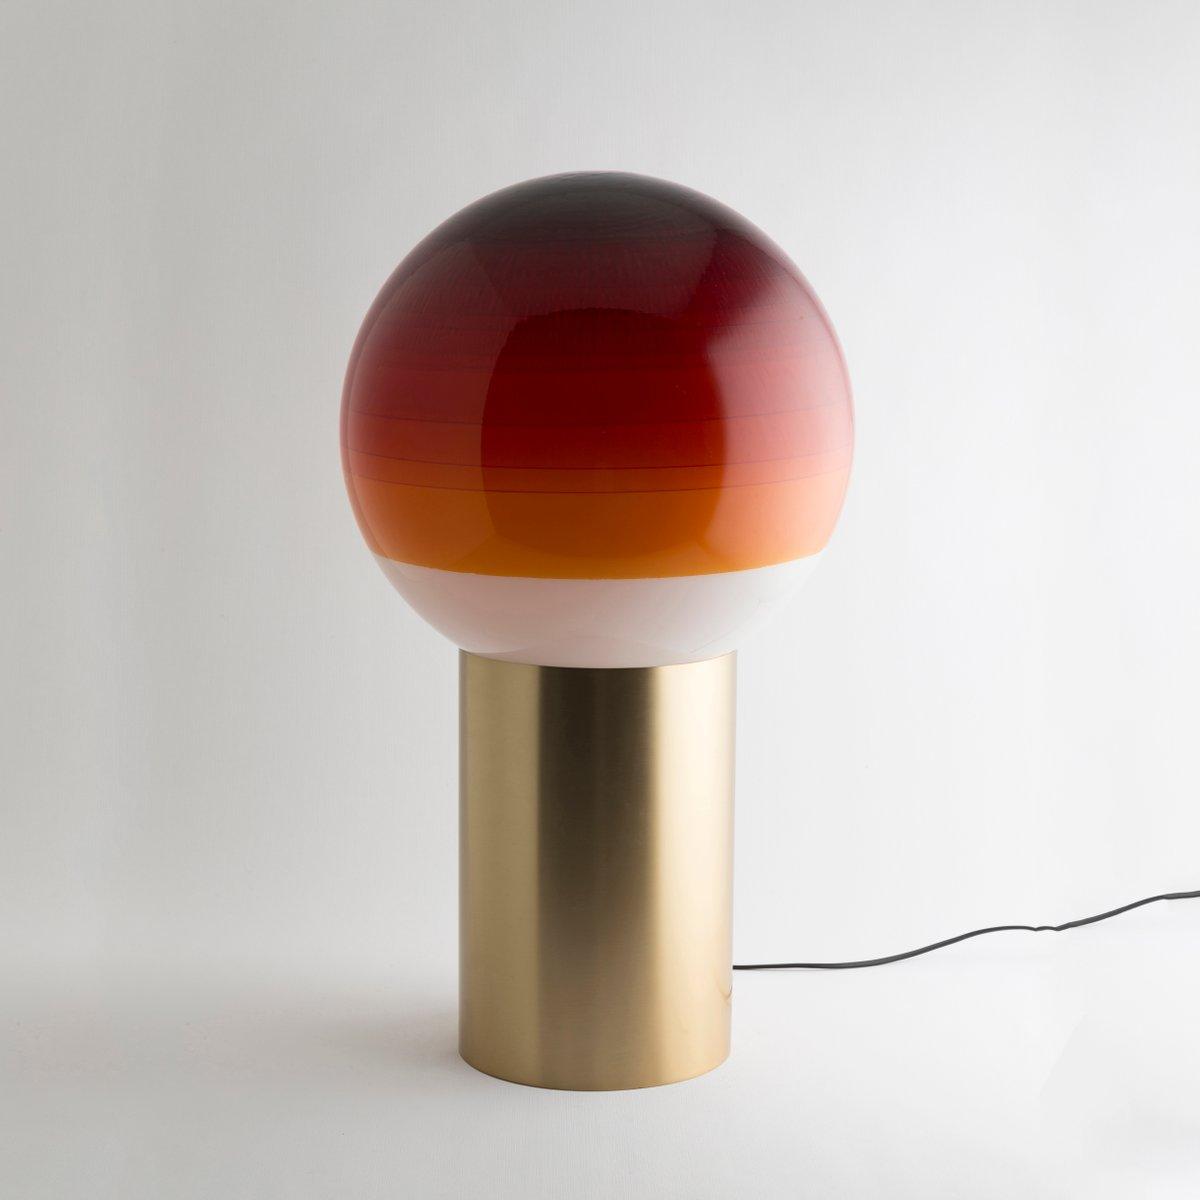 Extra Large Amber Dipping Light by Jordi Canudas, 2017